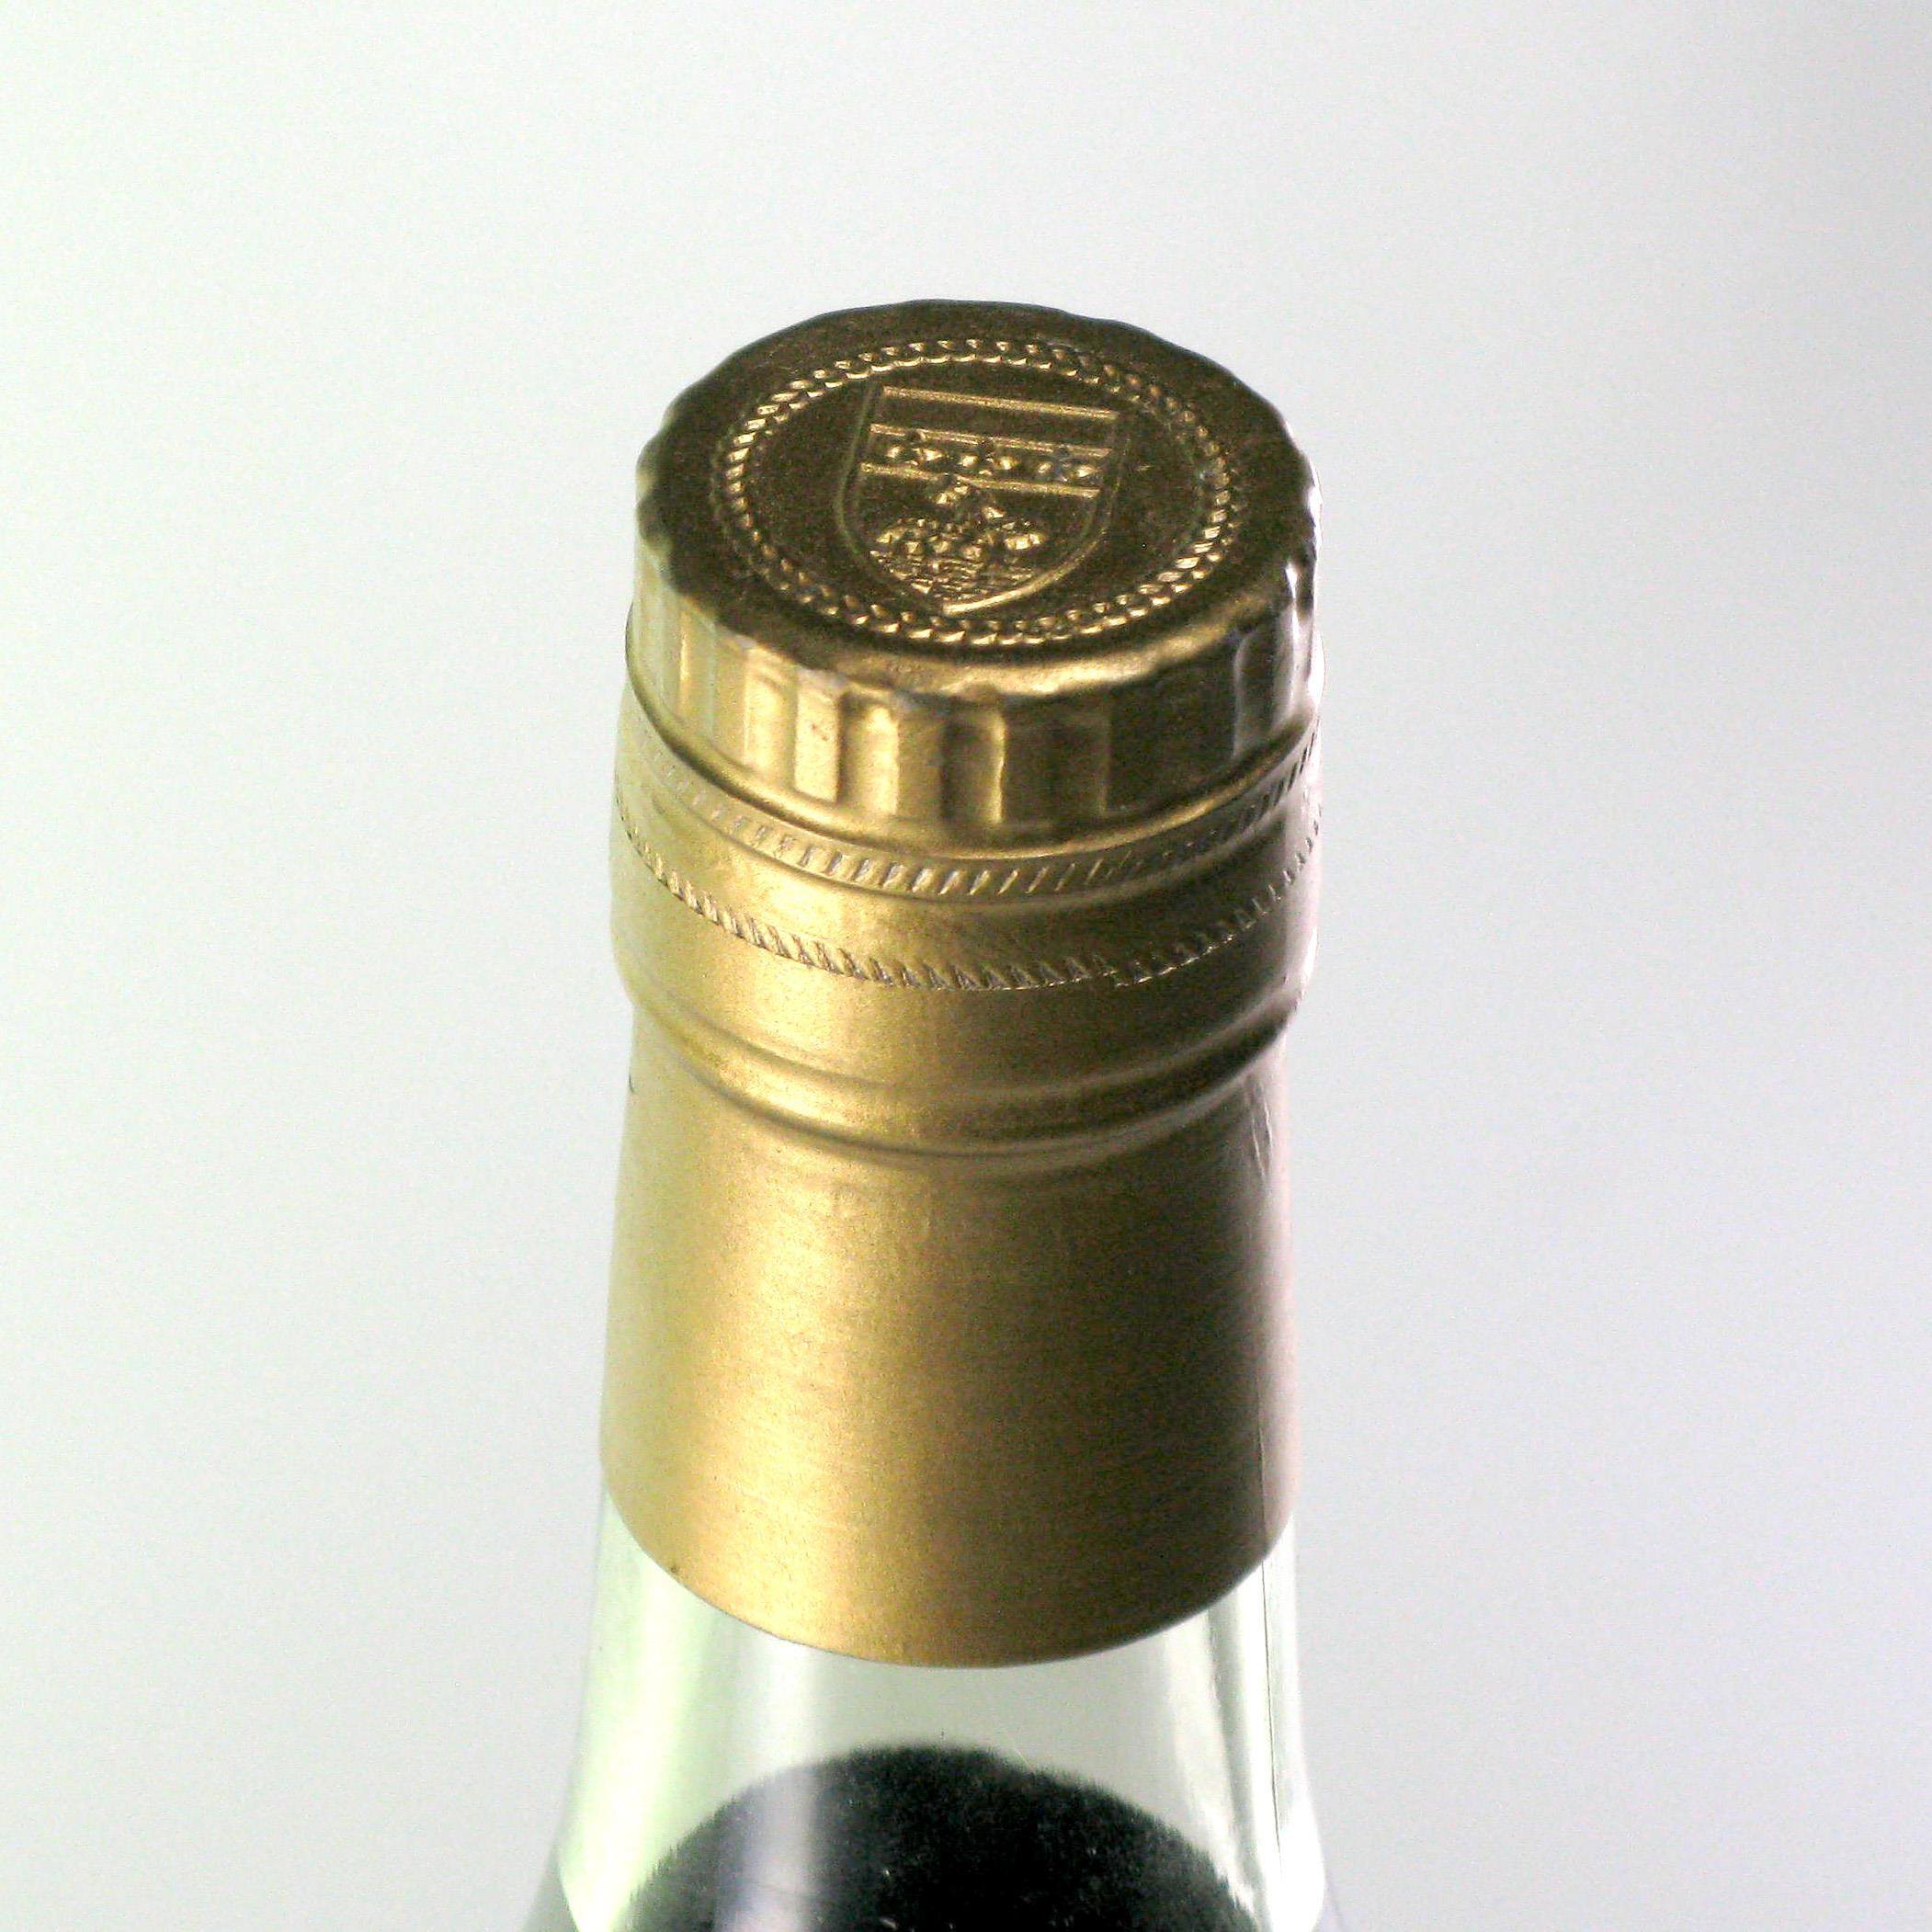 Cognac Heritage Mme Gaston Briand